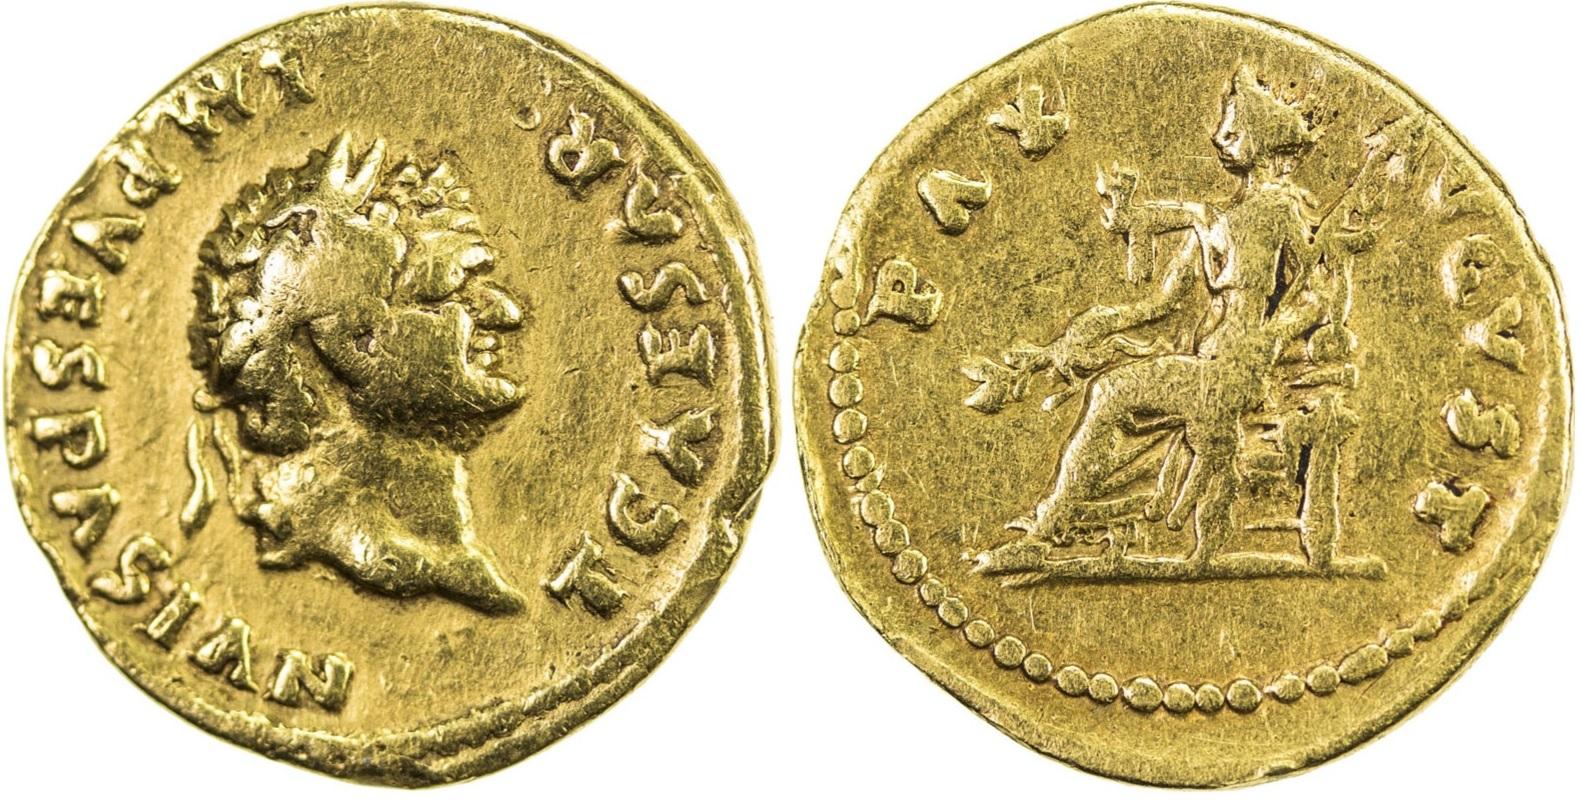 Ауреус (75-79 годы н.э.)